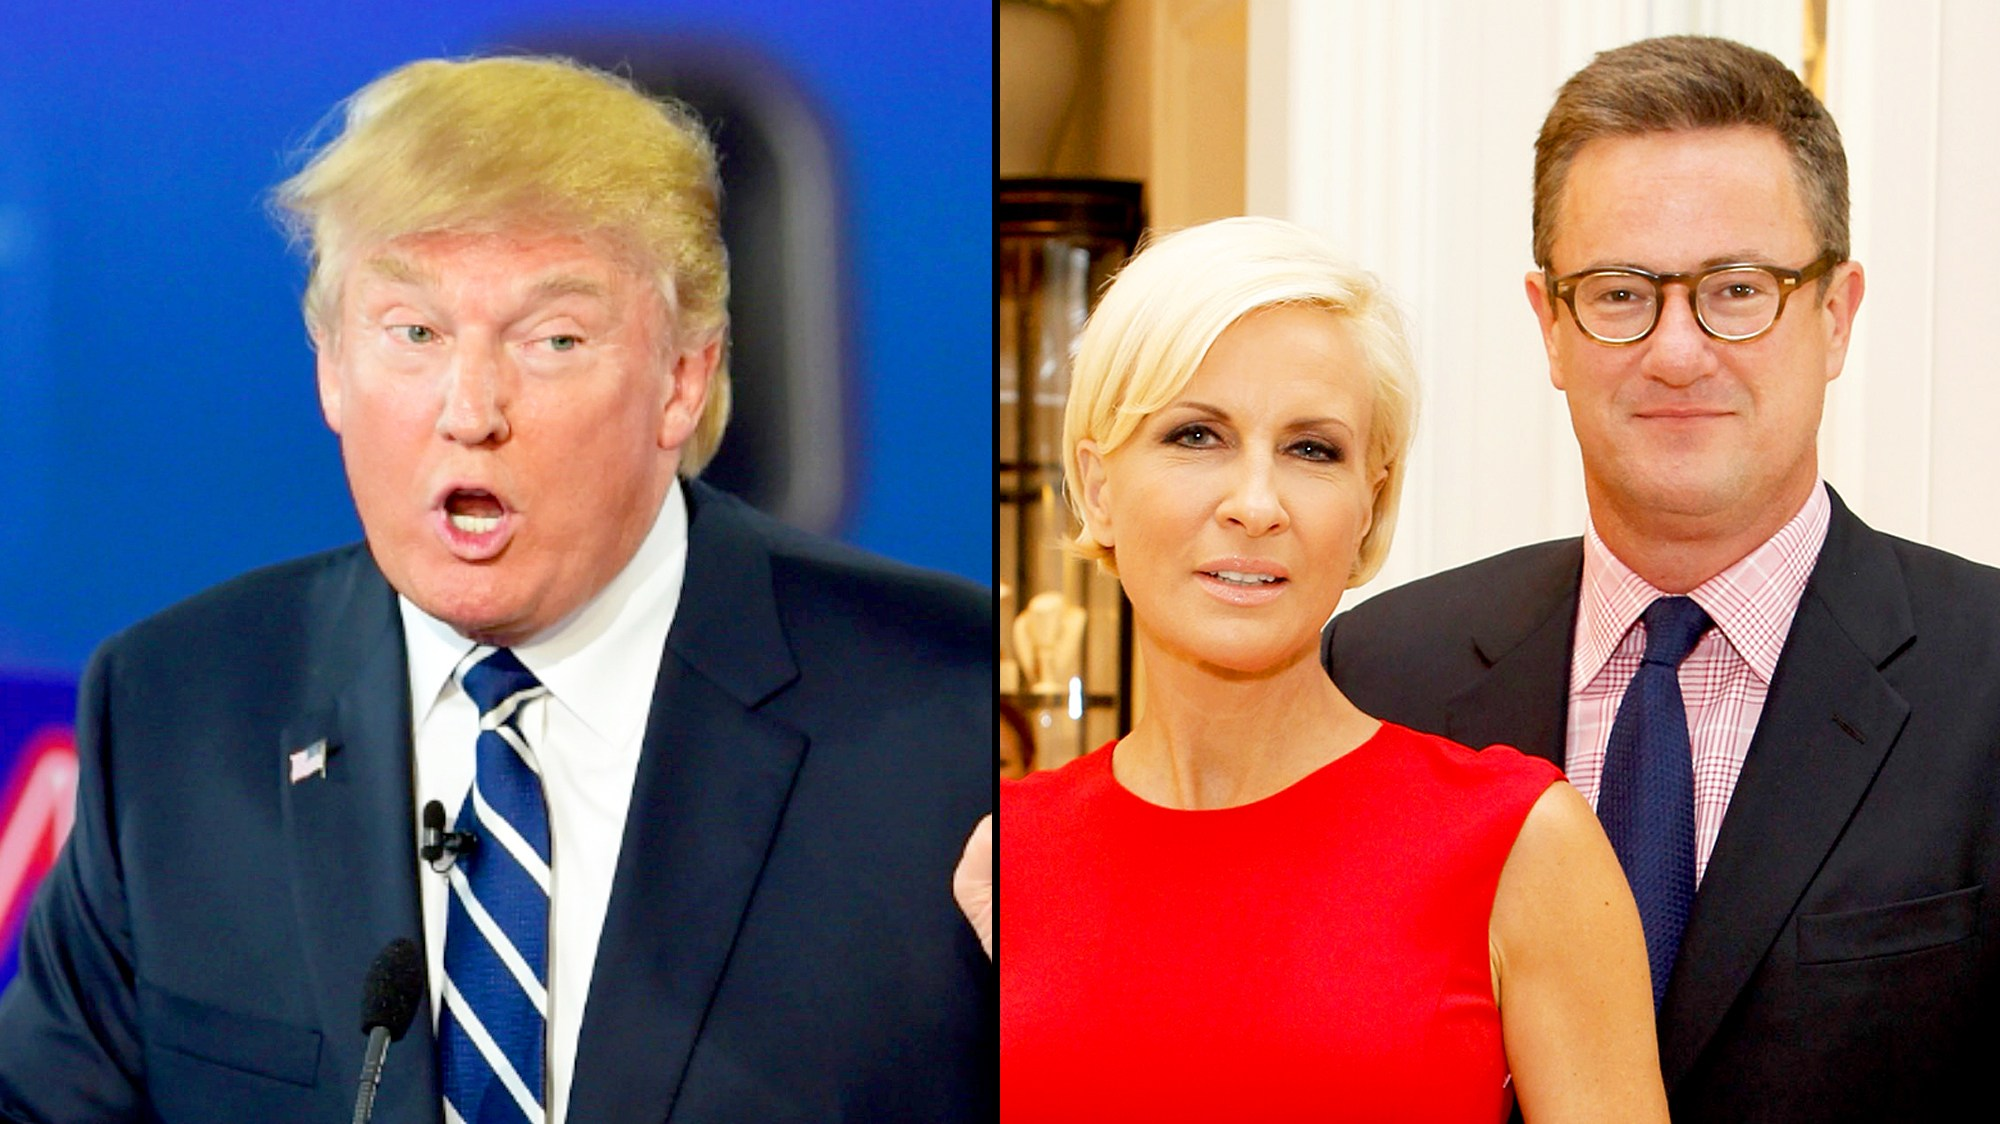 Donald Trump, Joe Scarborough and Mika Brzezinski